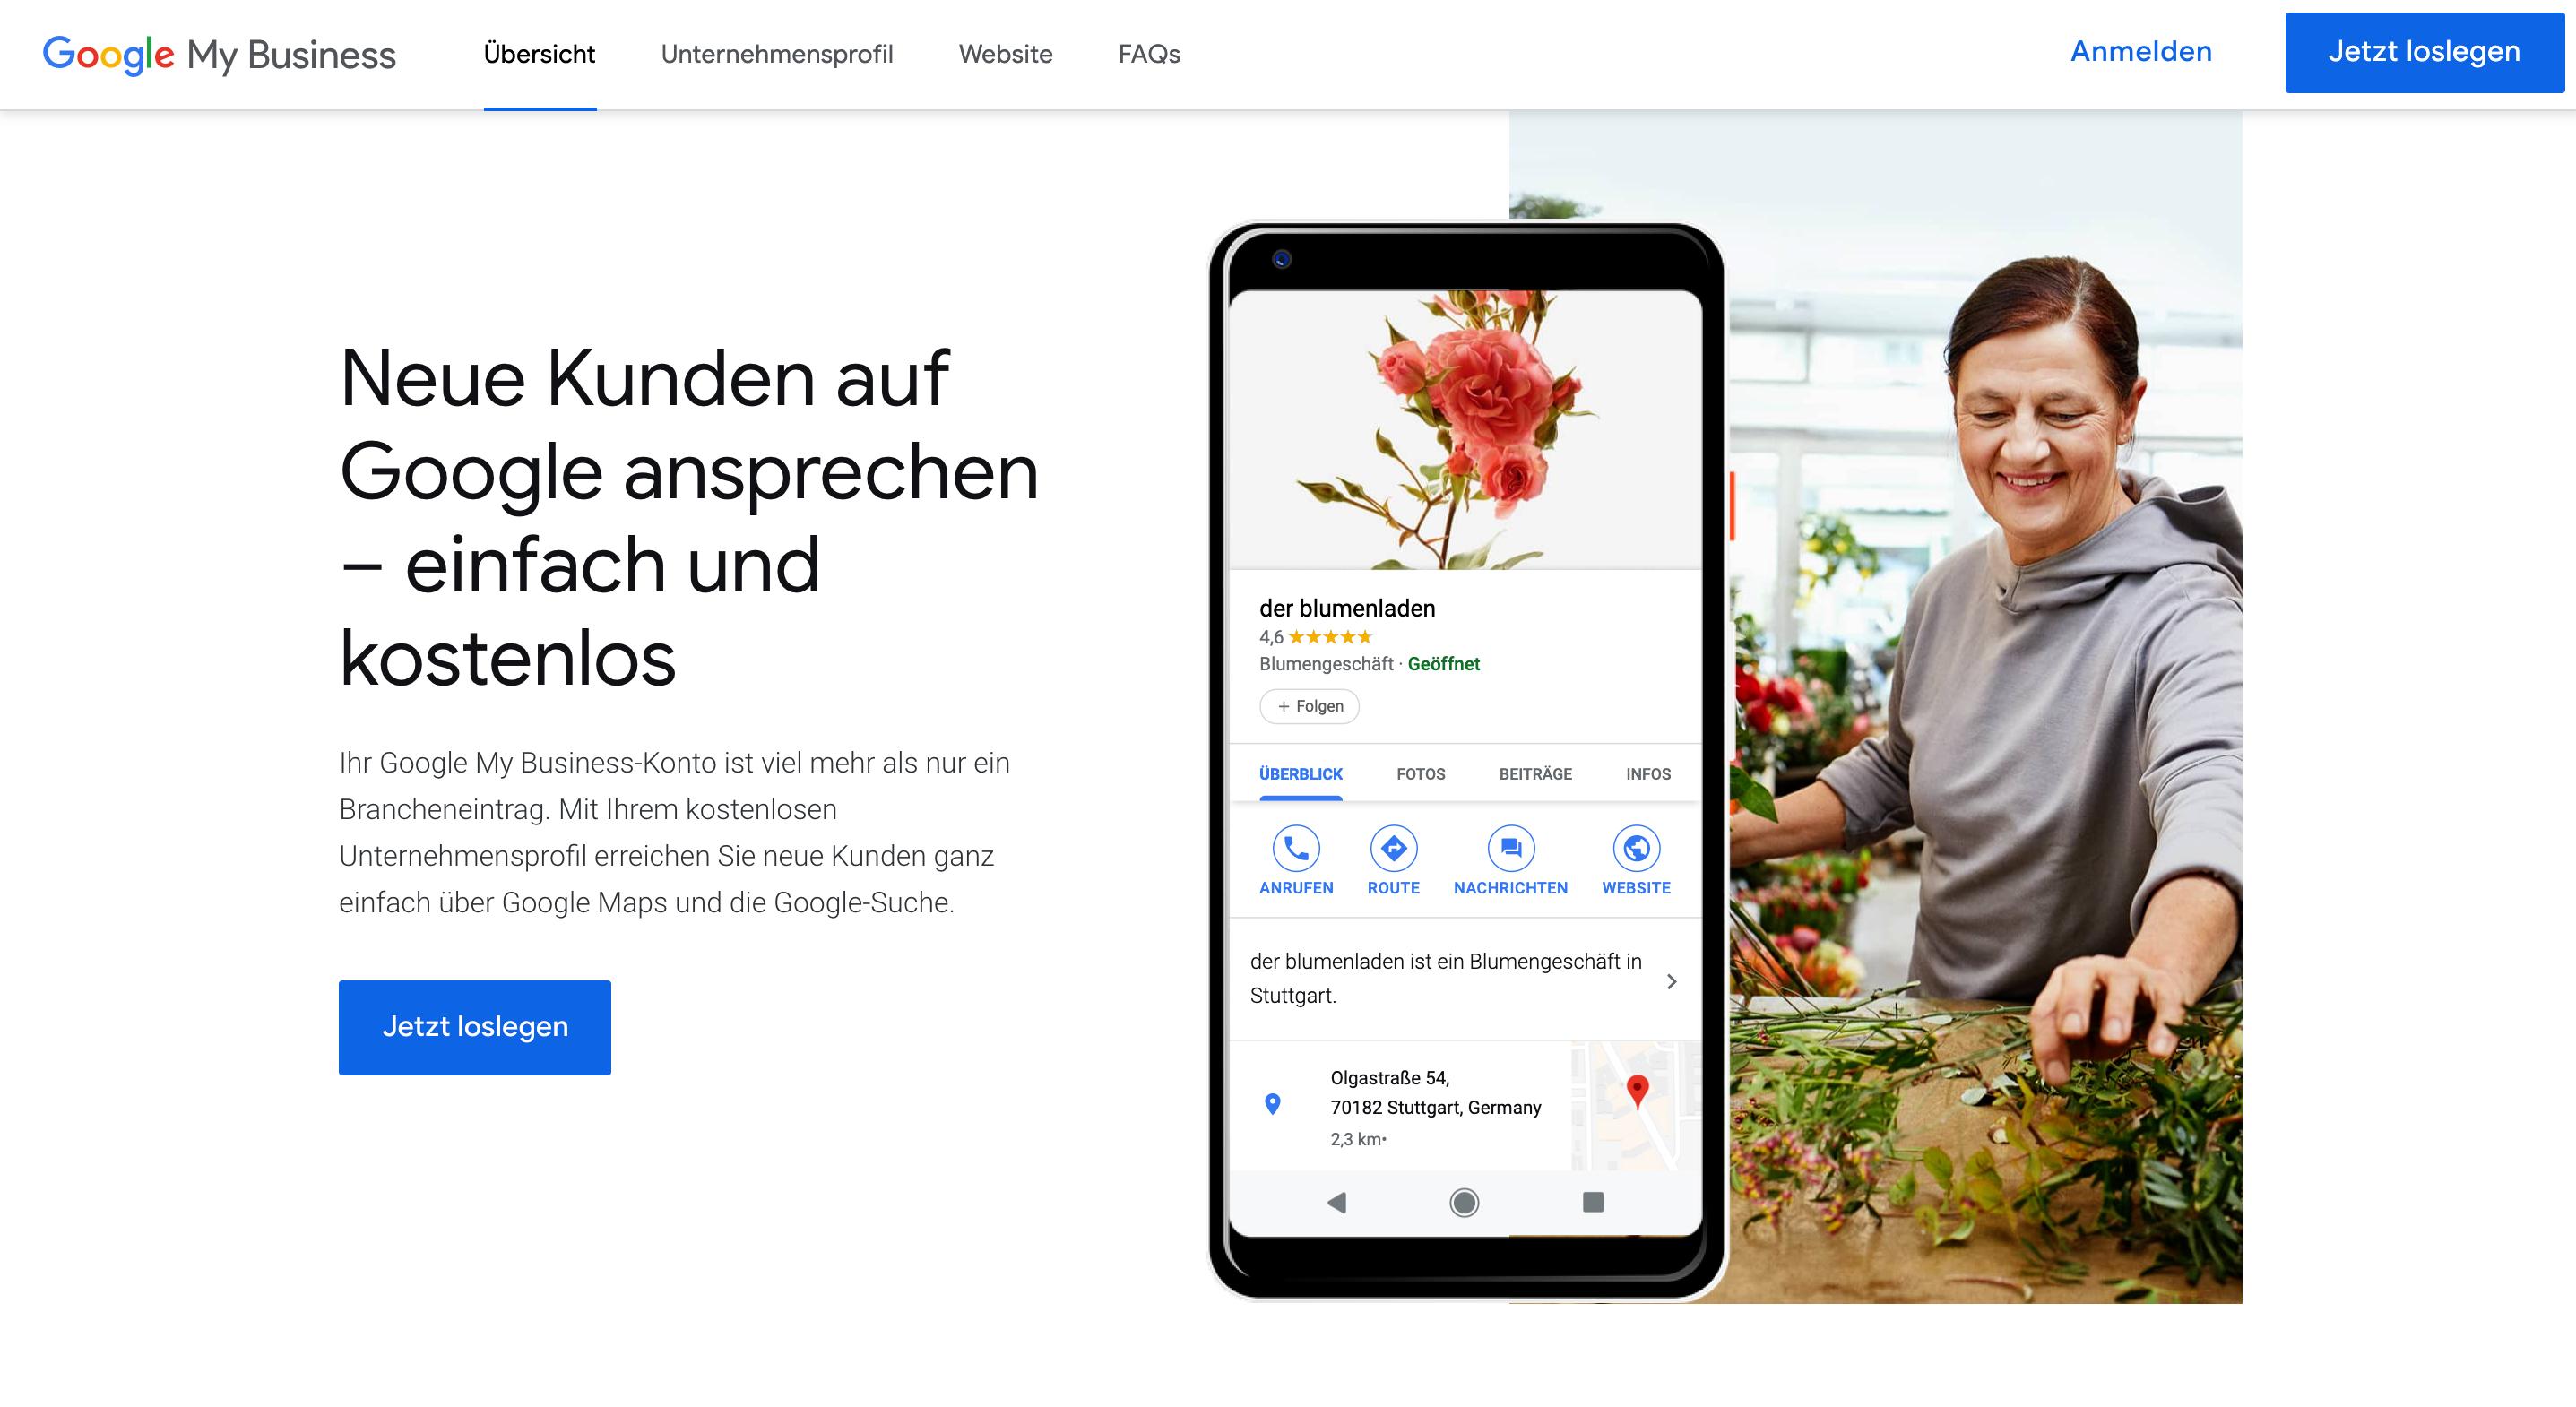 google my business image